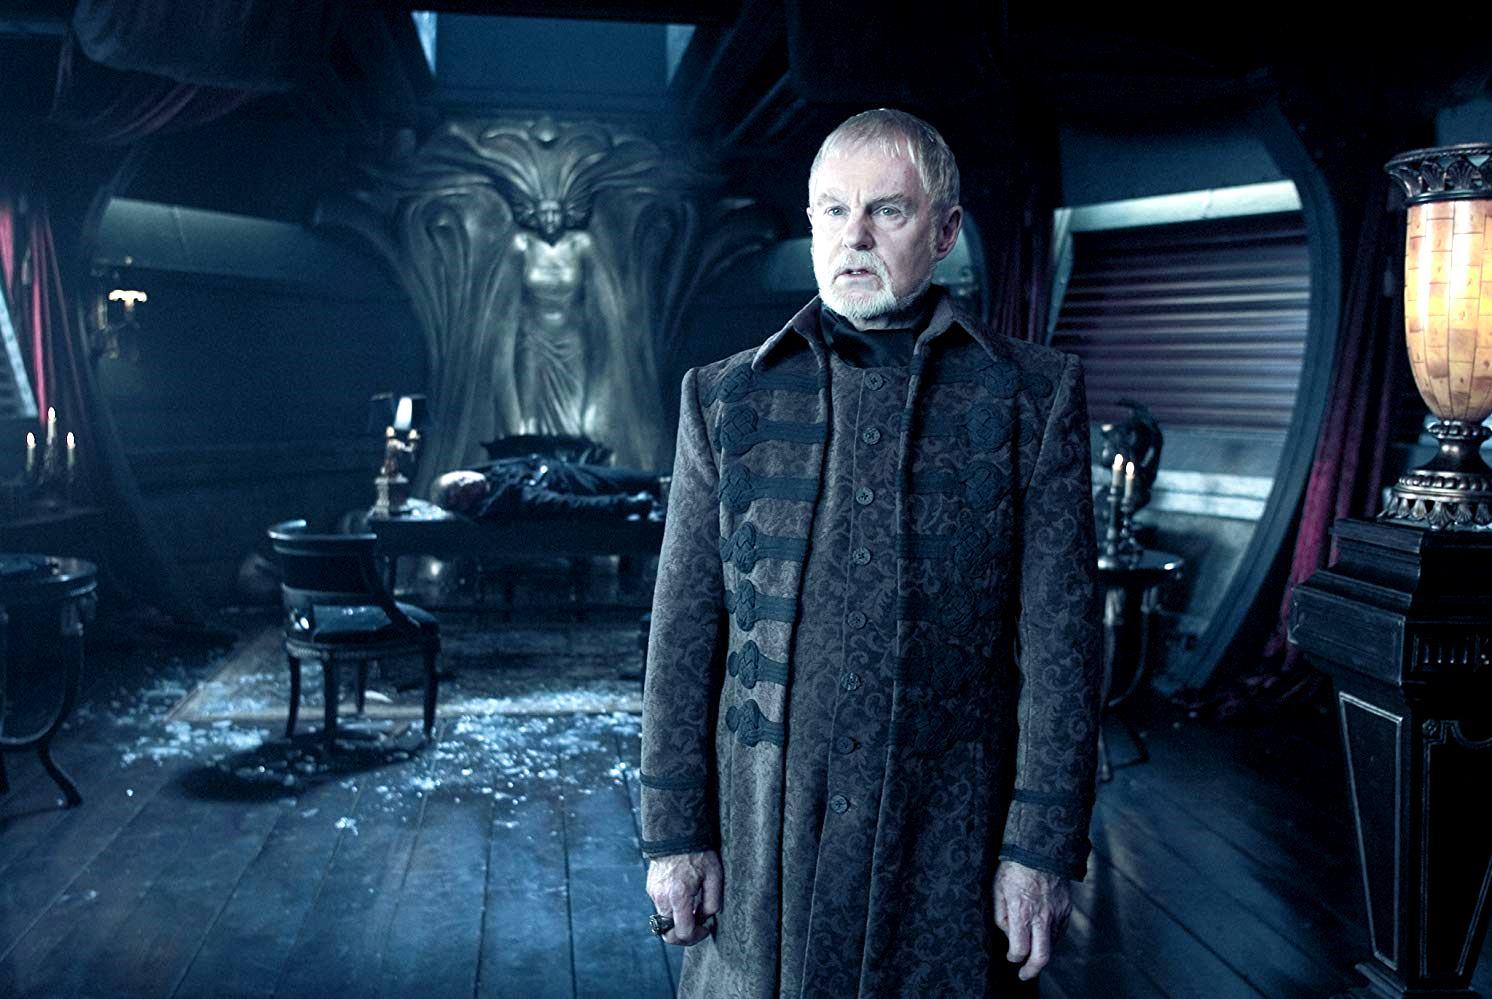 Derek Jacobi as Immortal patriarch Alexander Corvinus in Underworld: Evolution (2006)